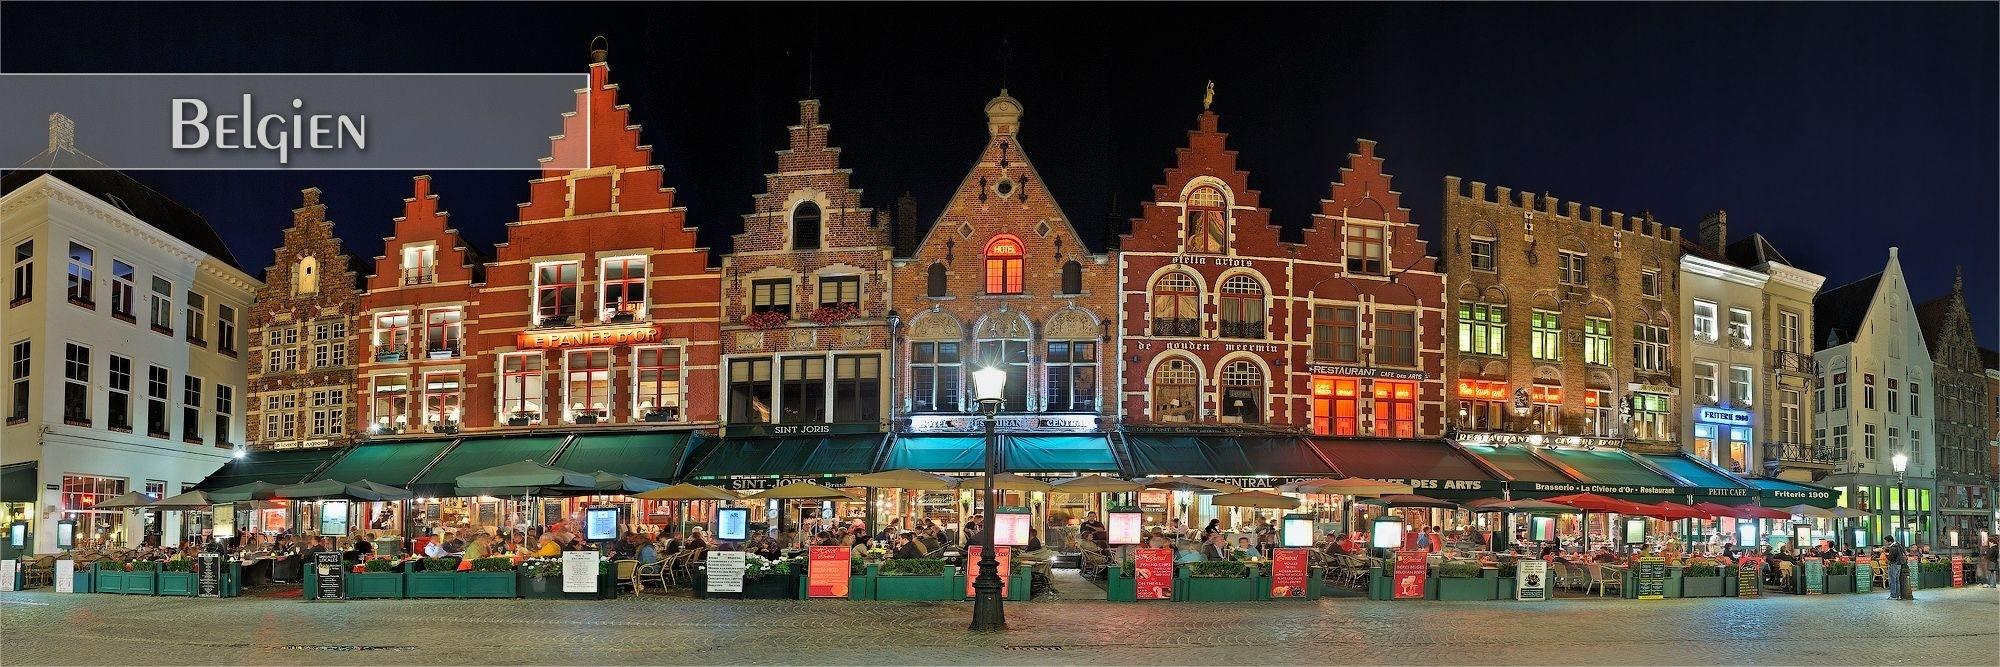 FineArt & Panoramafotografien aus Belgien